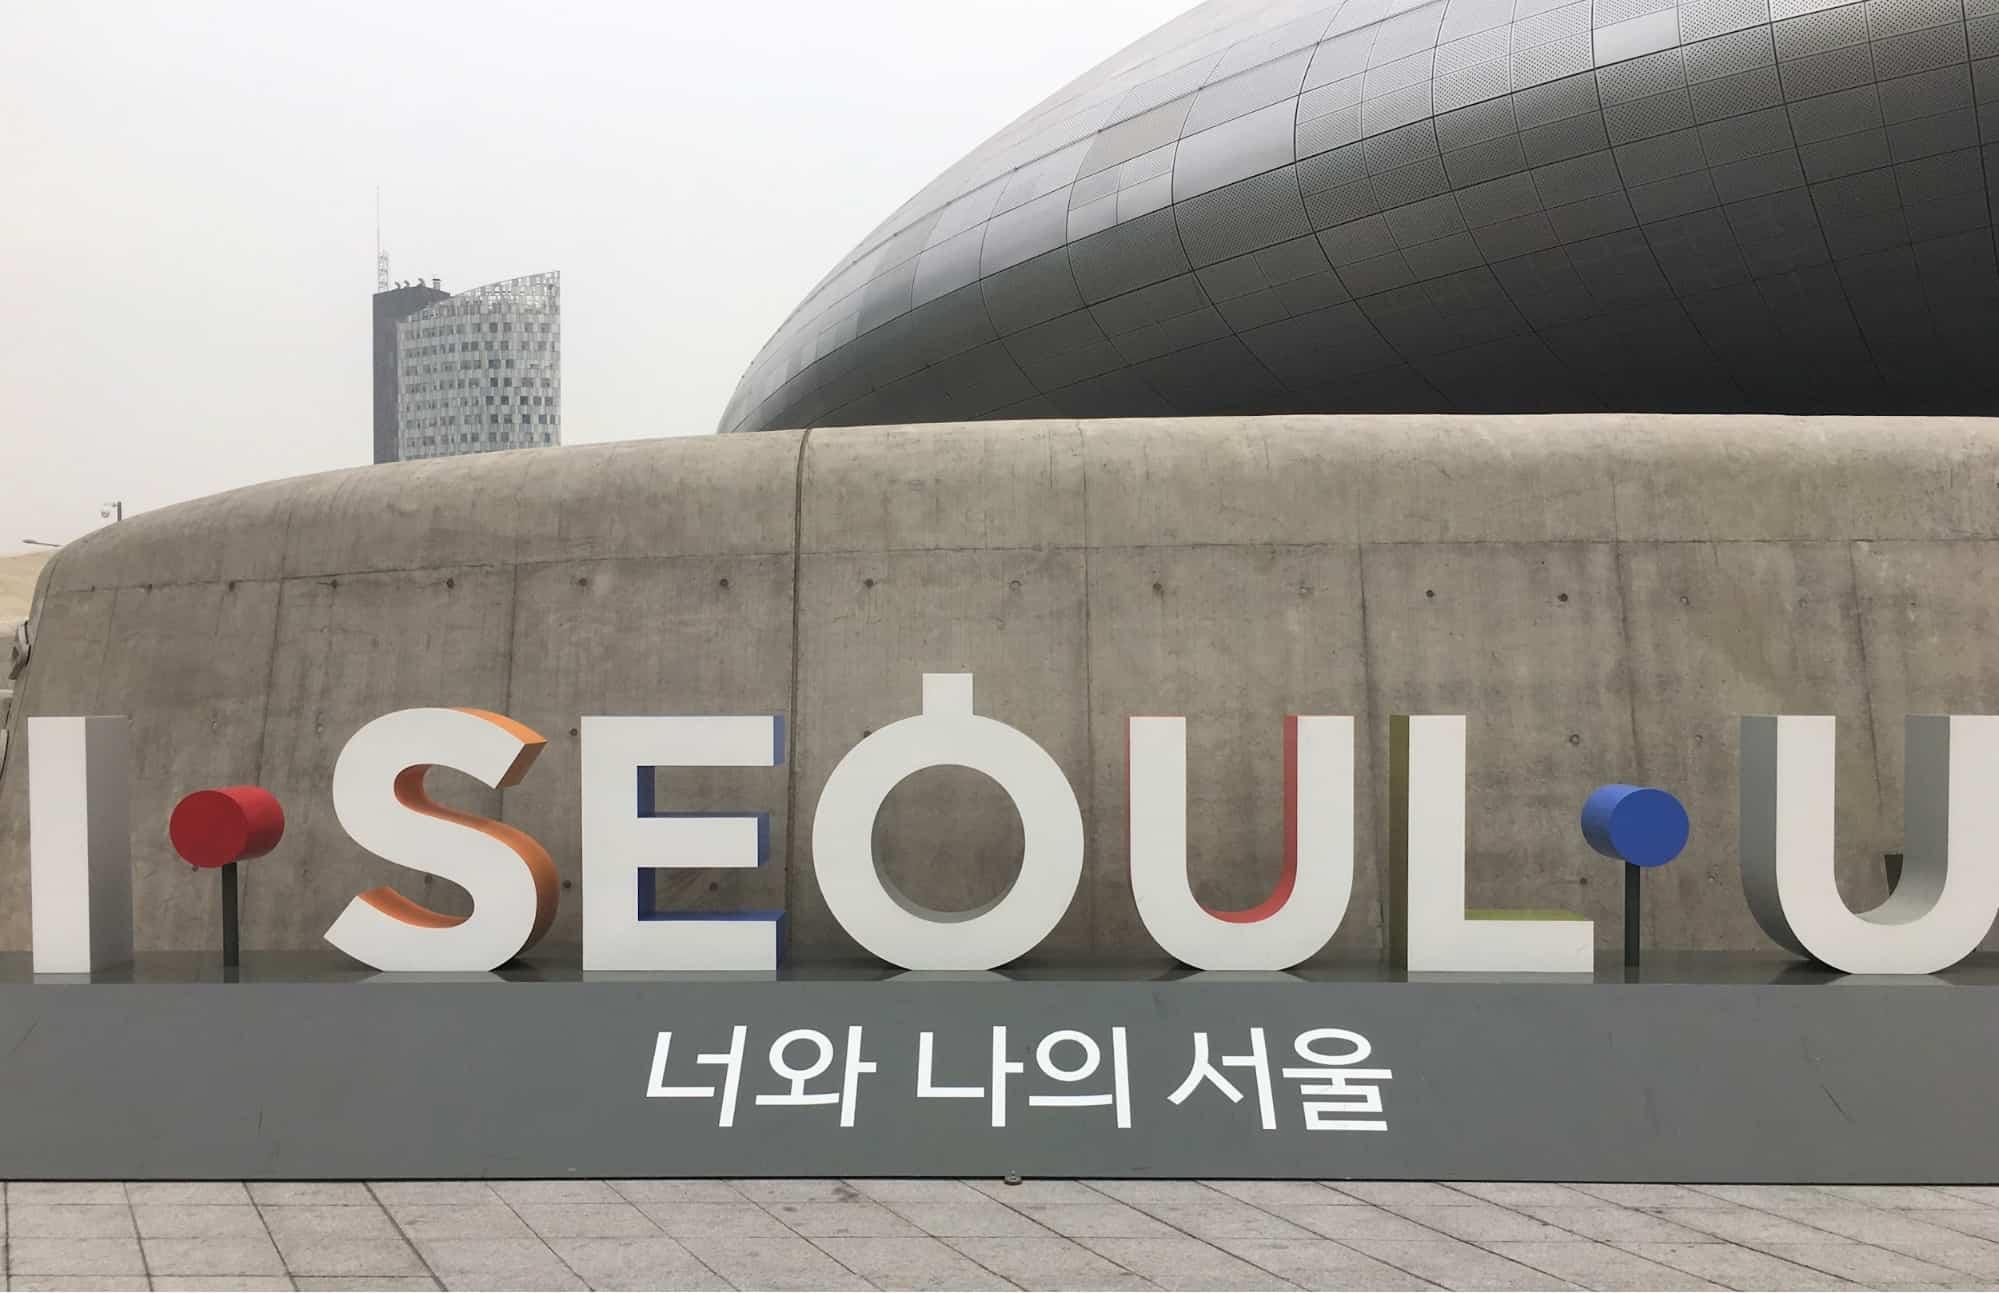 Travel Tips for Seoul South Korea